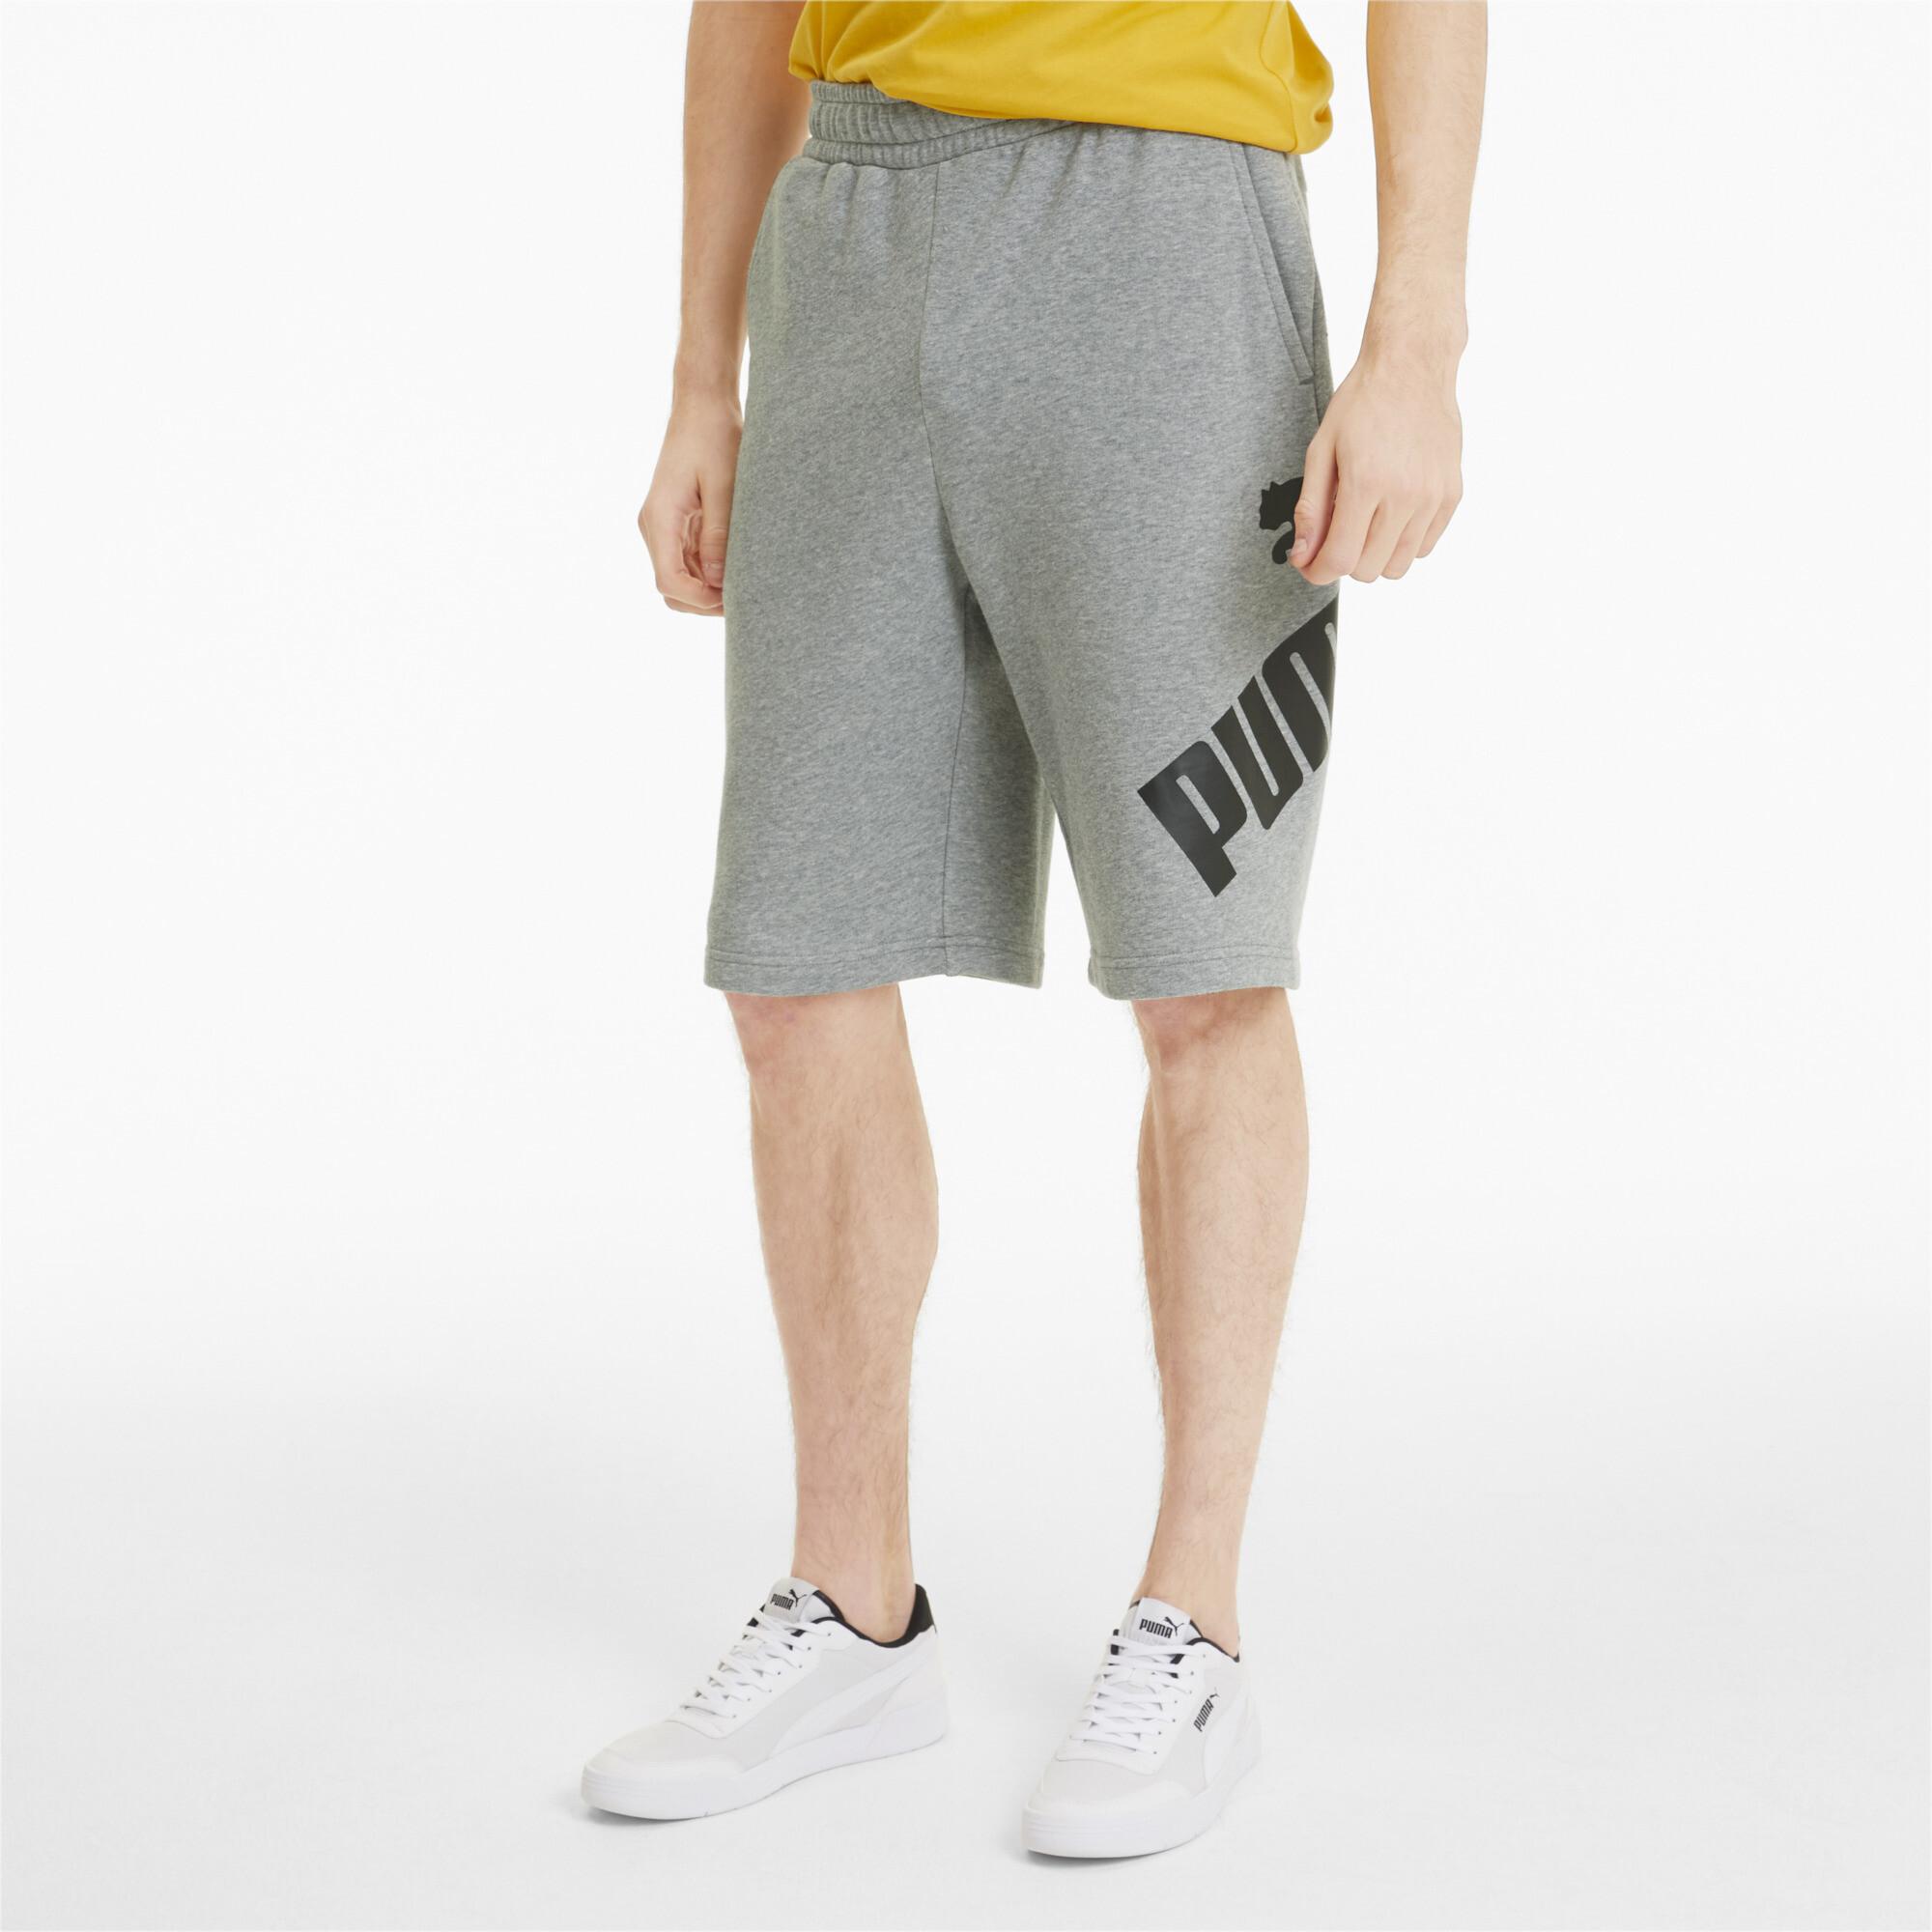 PUMA-Big-Logo-Men-039-s-Shorts-Men-Knitted-Shorts-Basics thumbnail 9